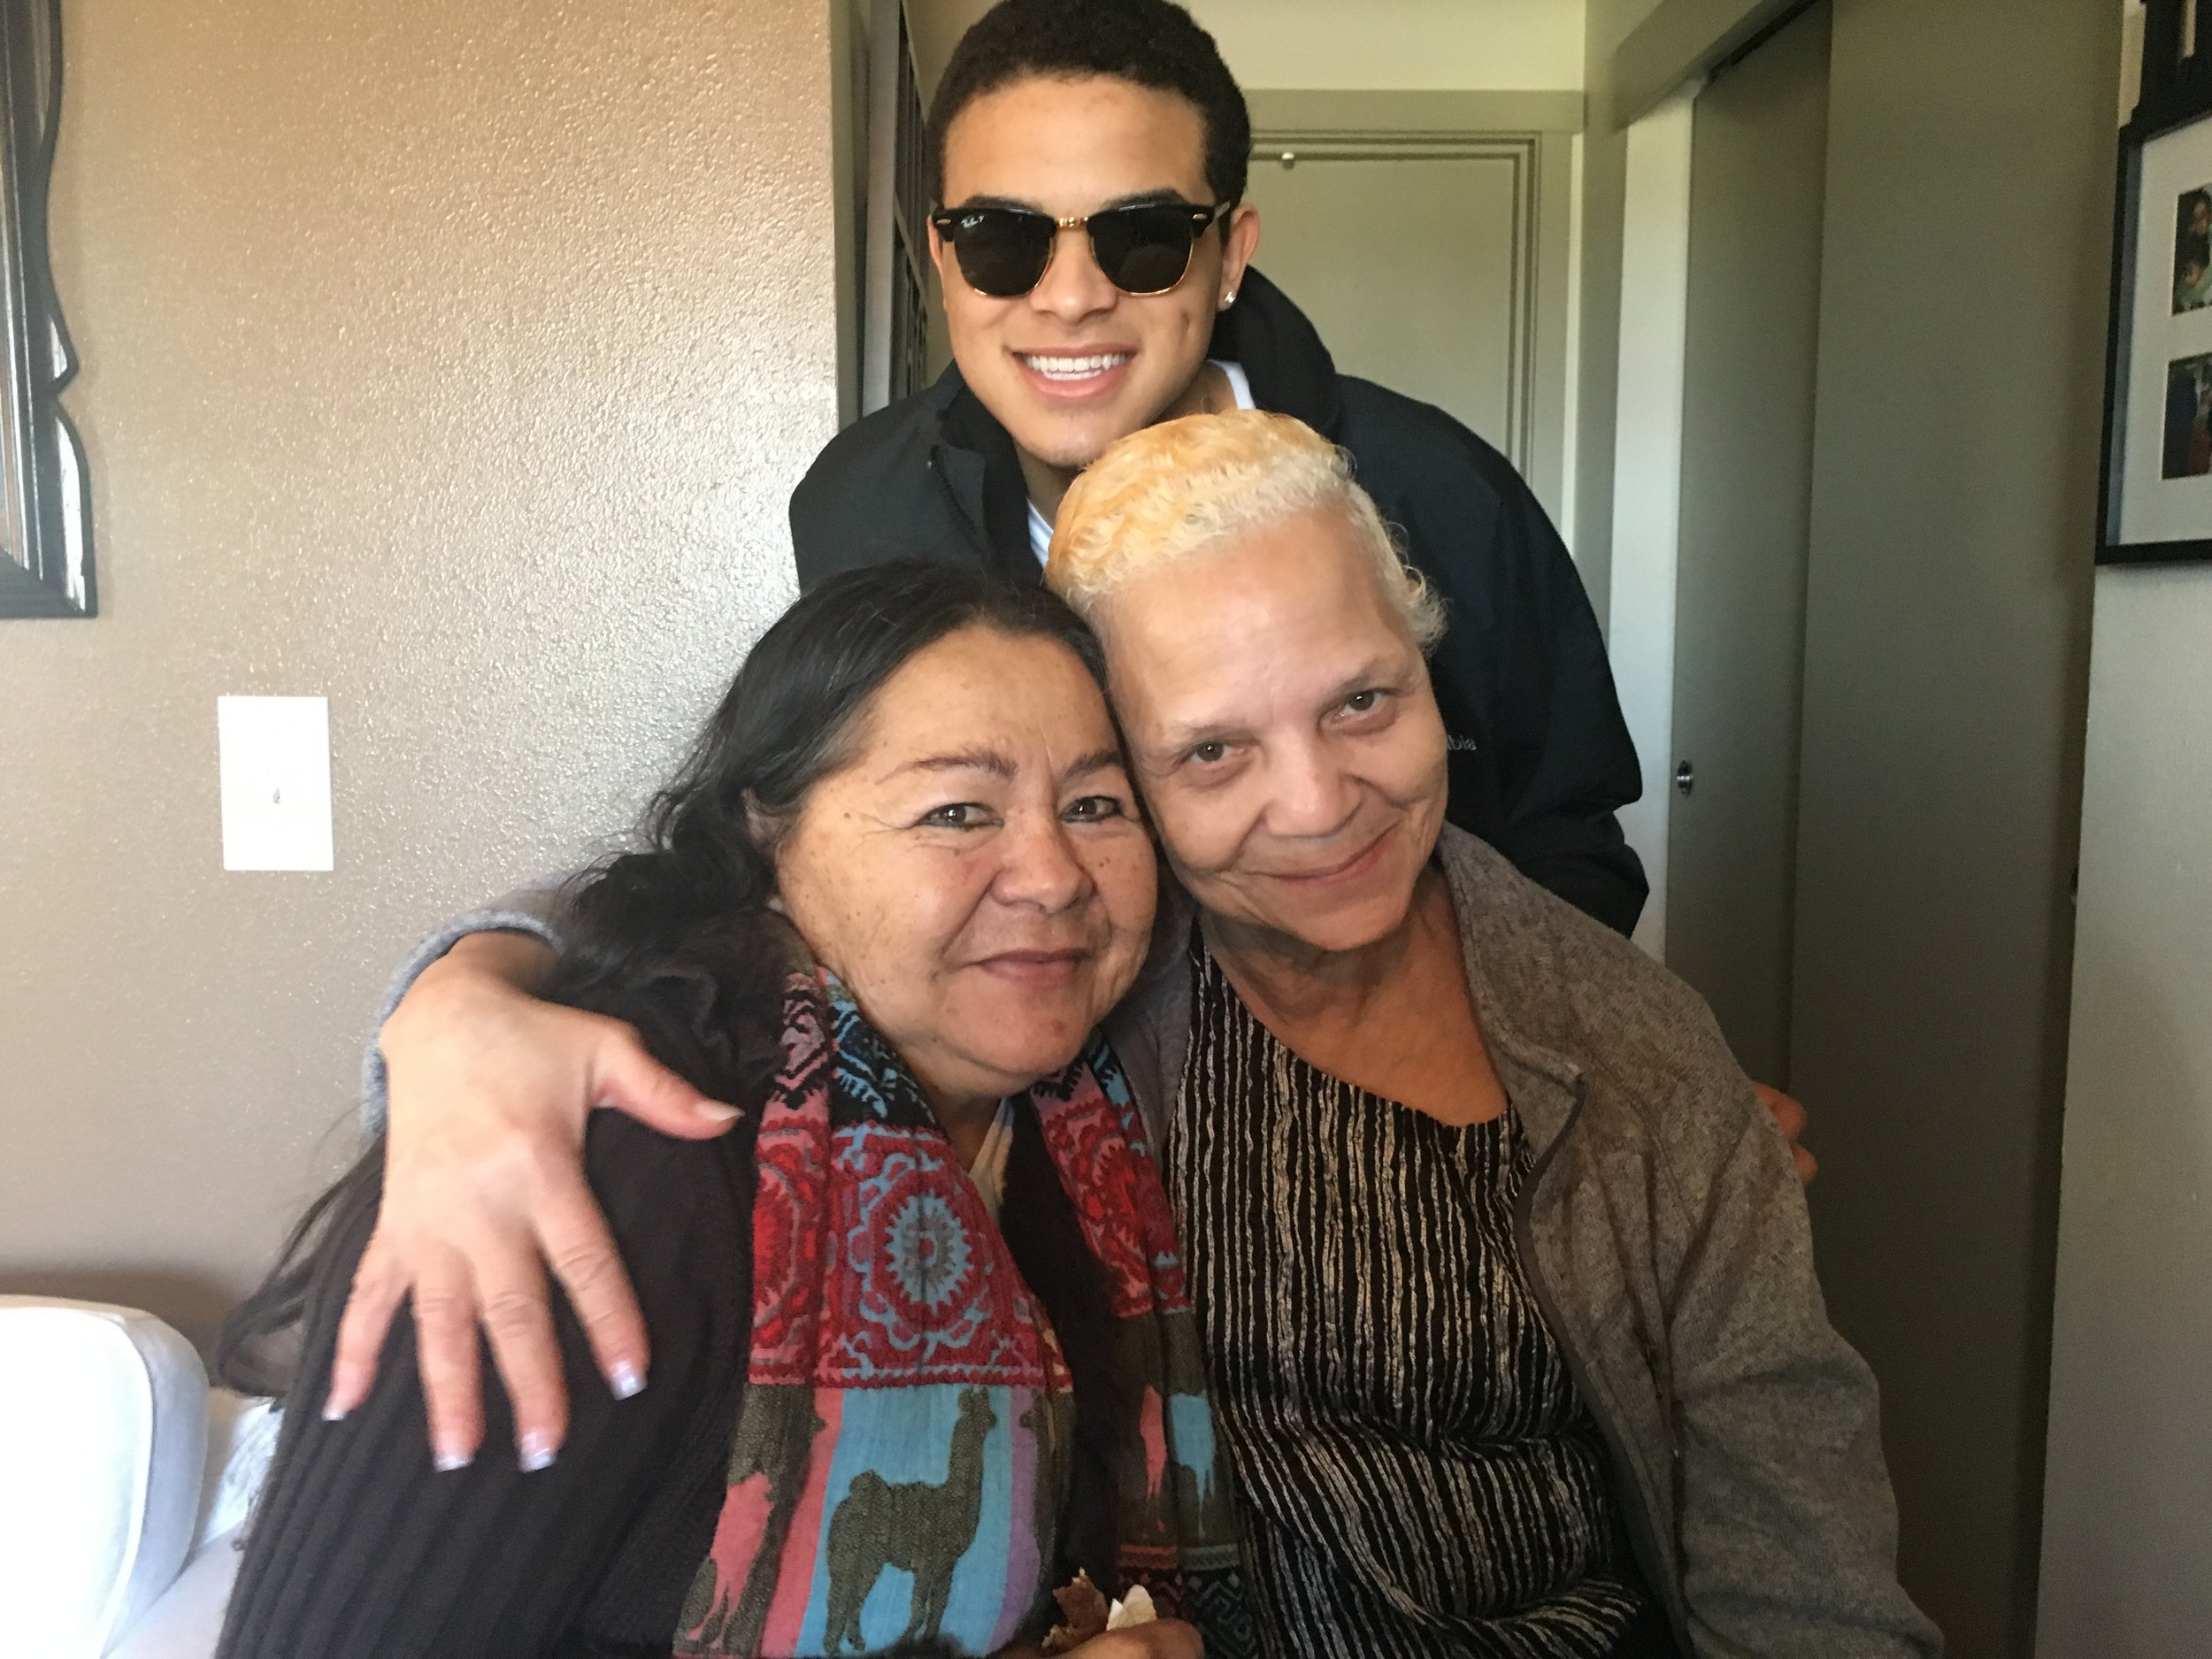 Craig and his grandmas